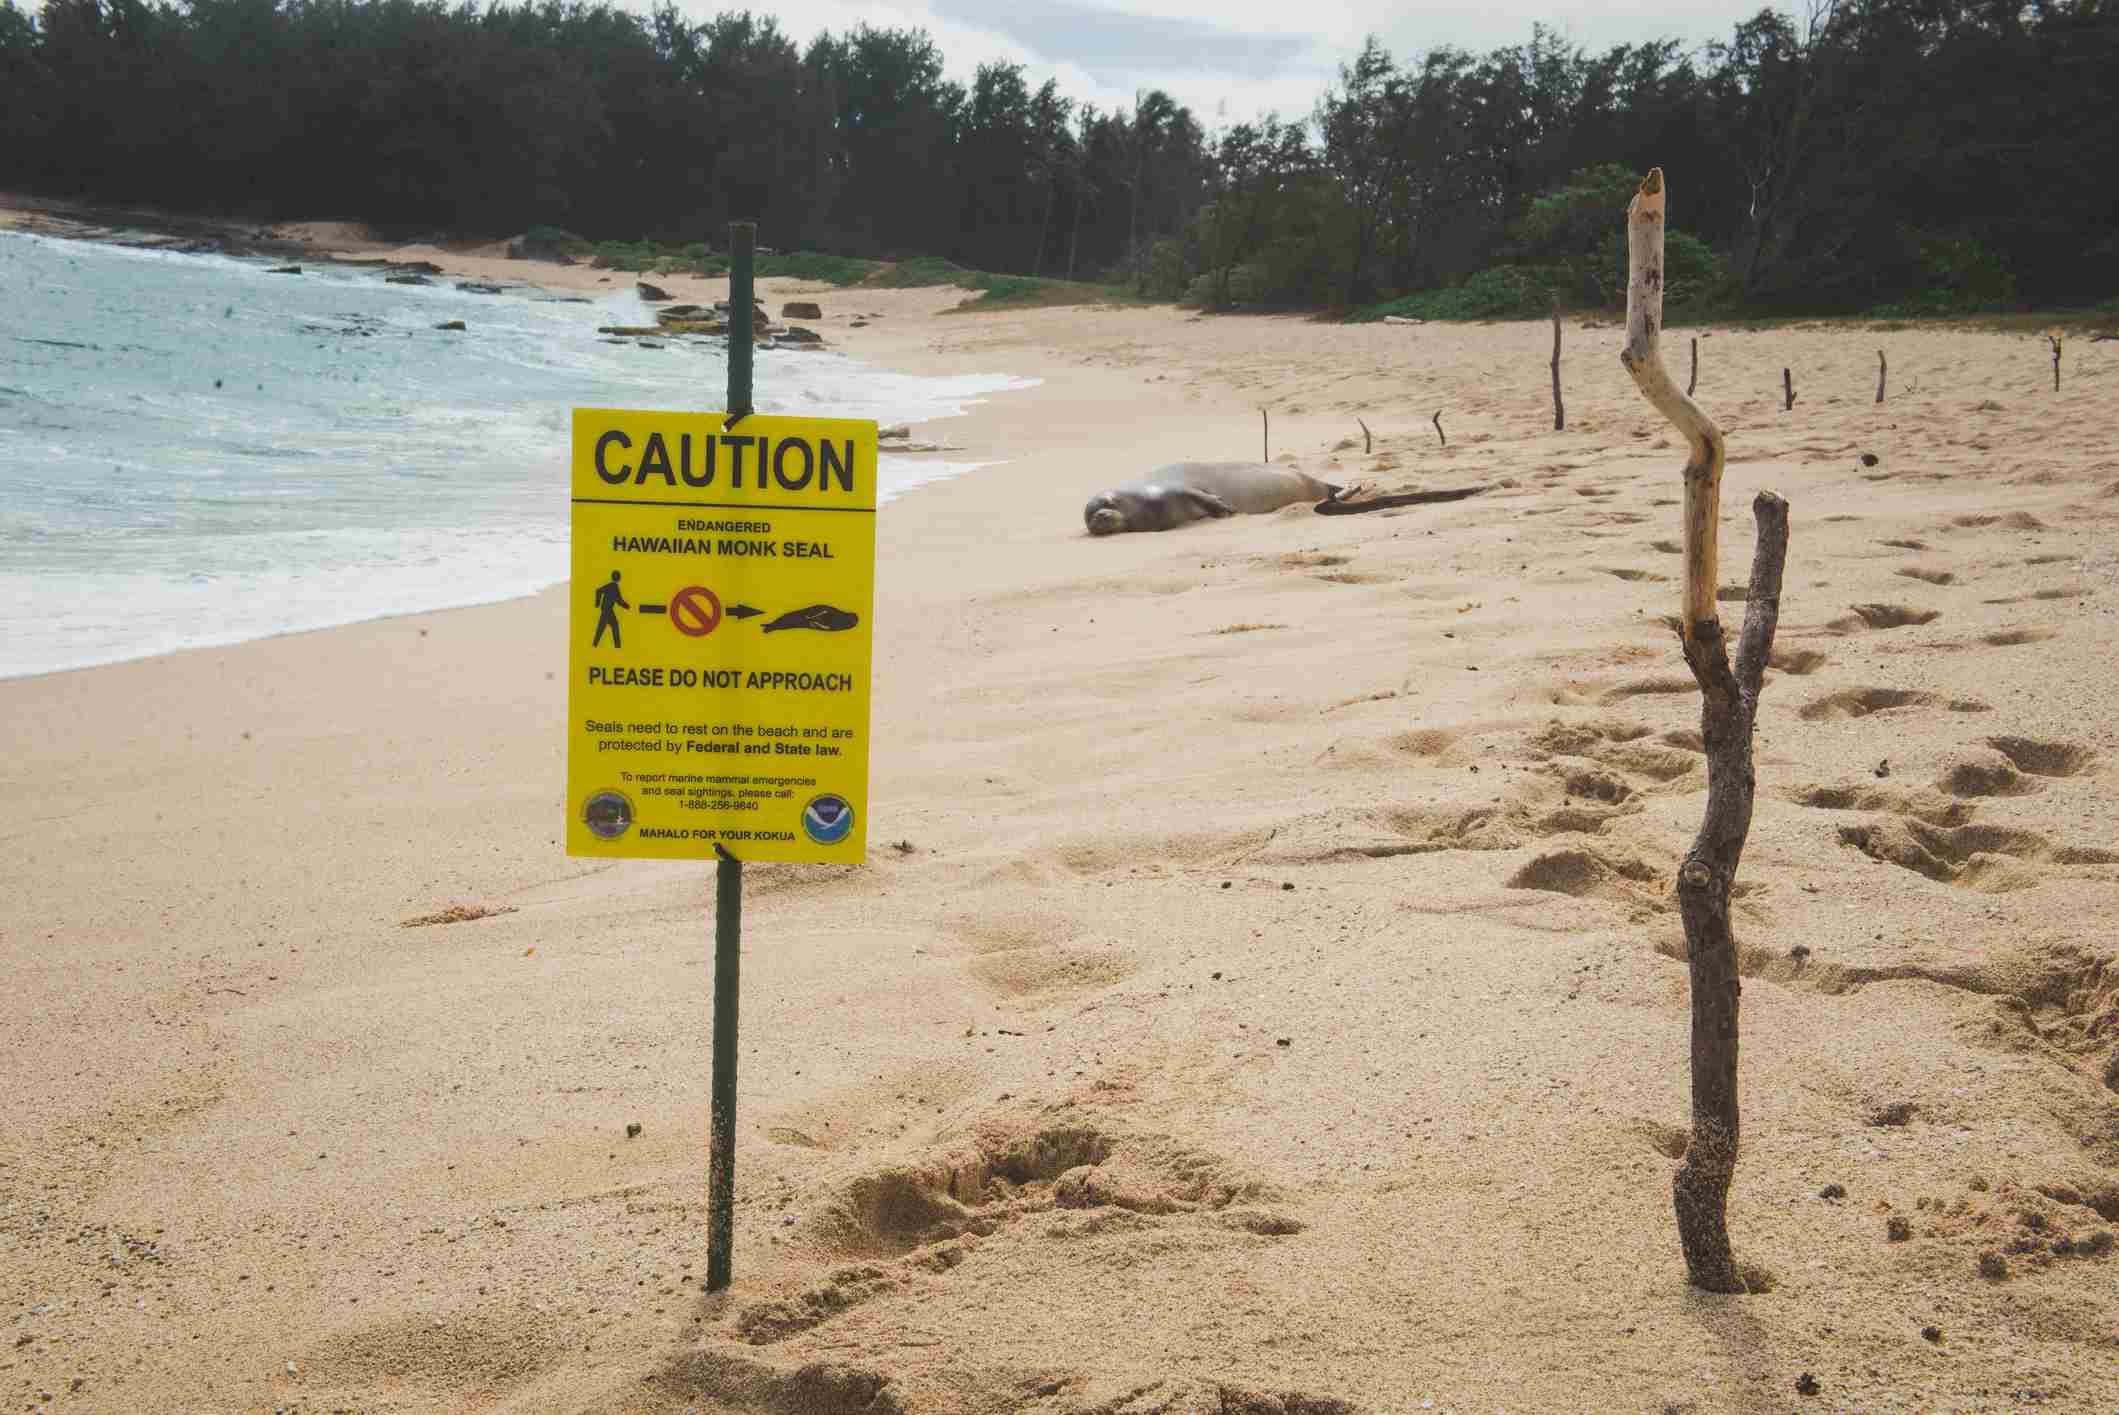 Disturbing a Hawaiian monk seal is illegal. Violators face a hefty fine.